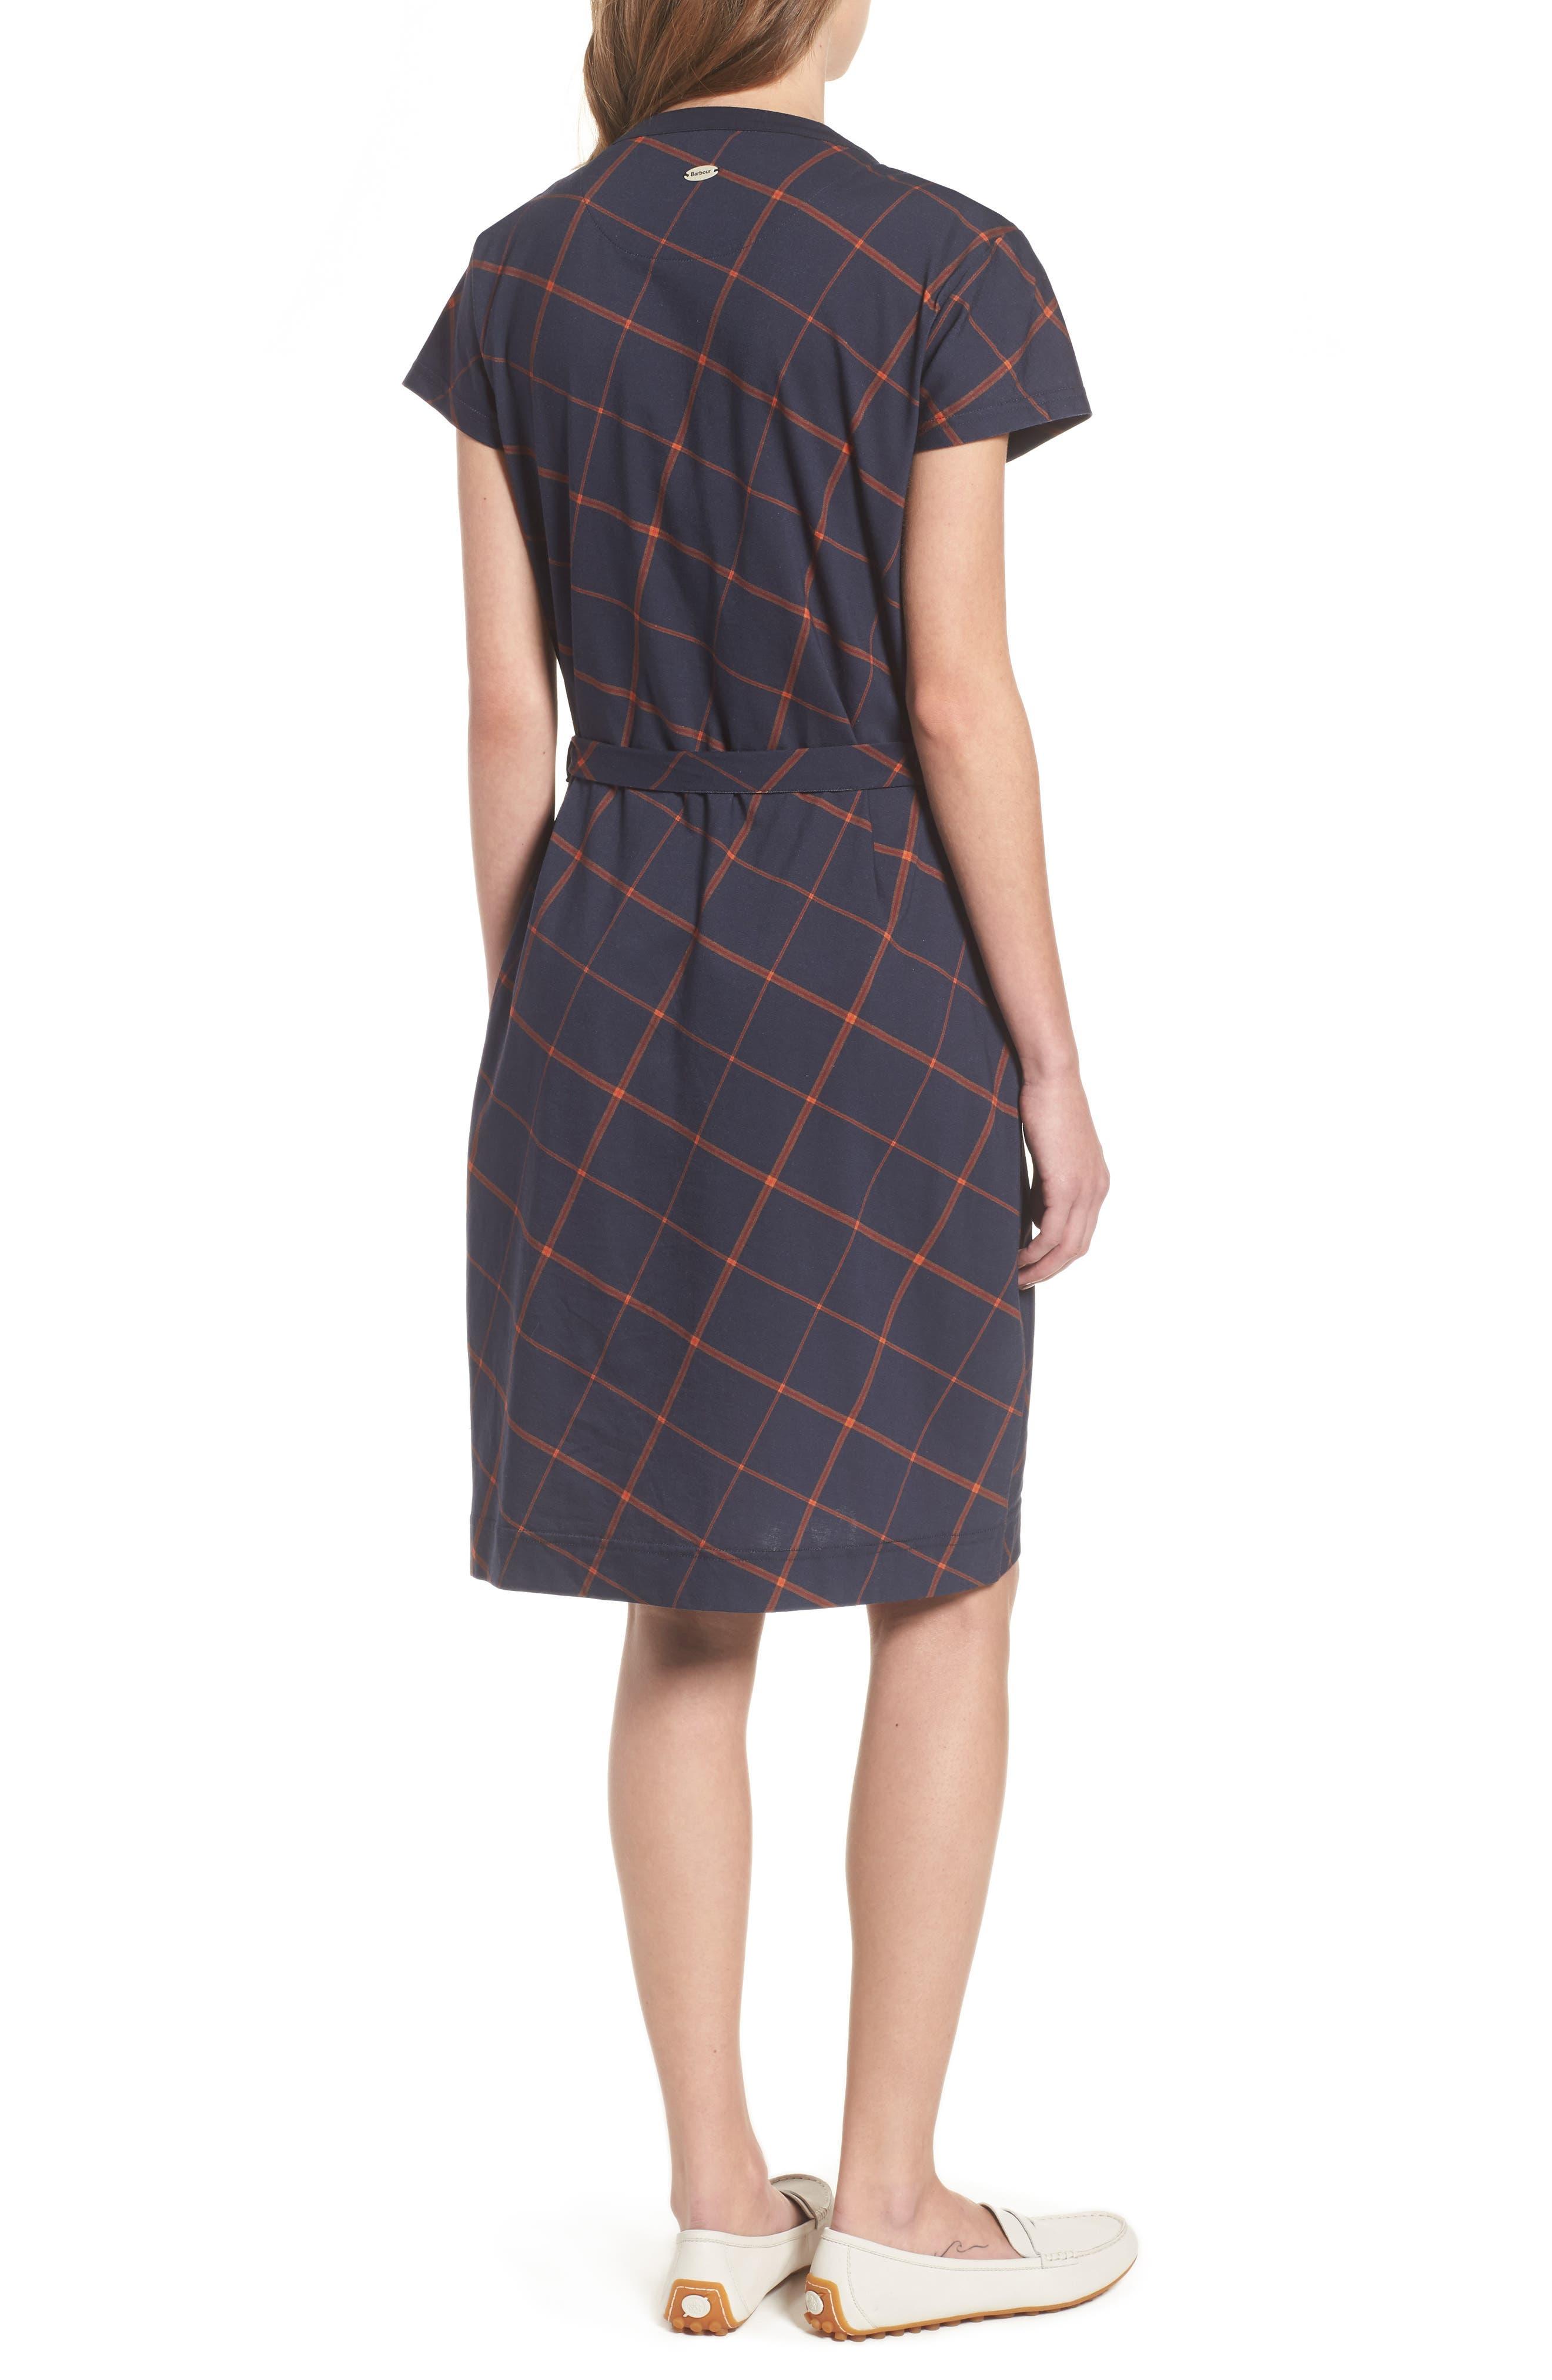 Glenrothes Windowpane Plaid Dress,                             Alternate thumbnail 2, color,                             Navy Check